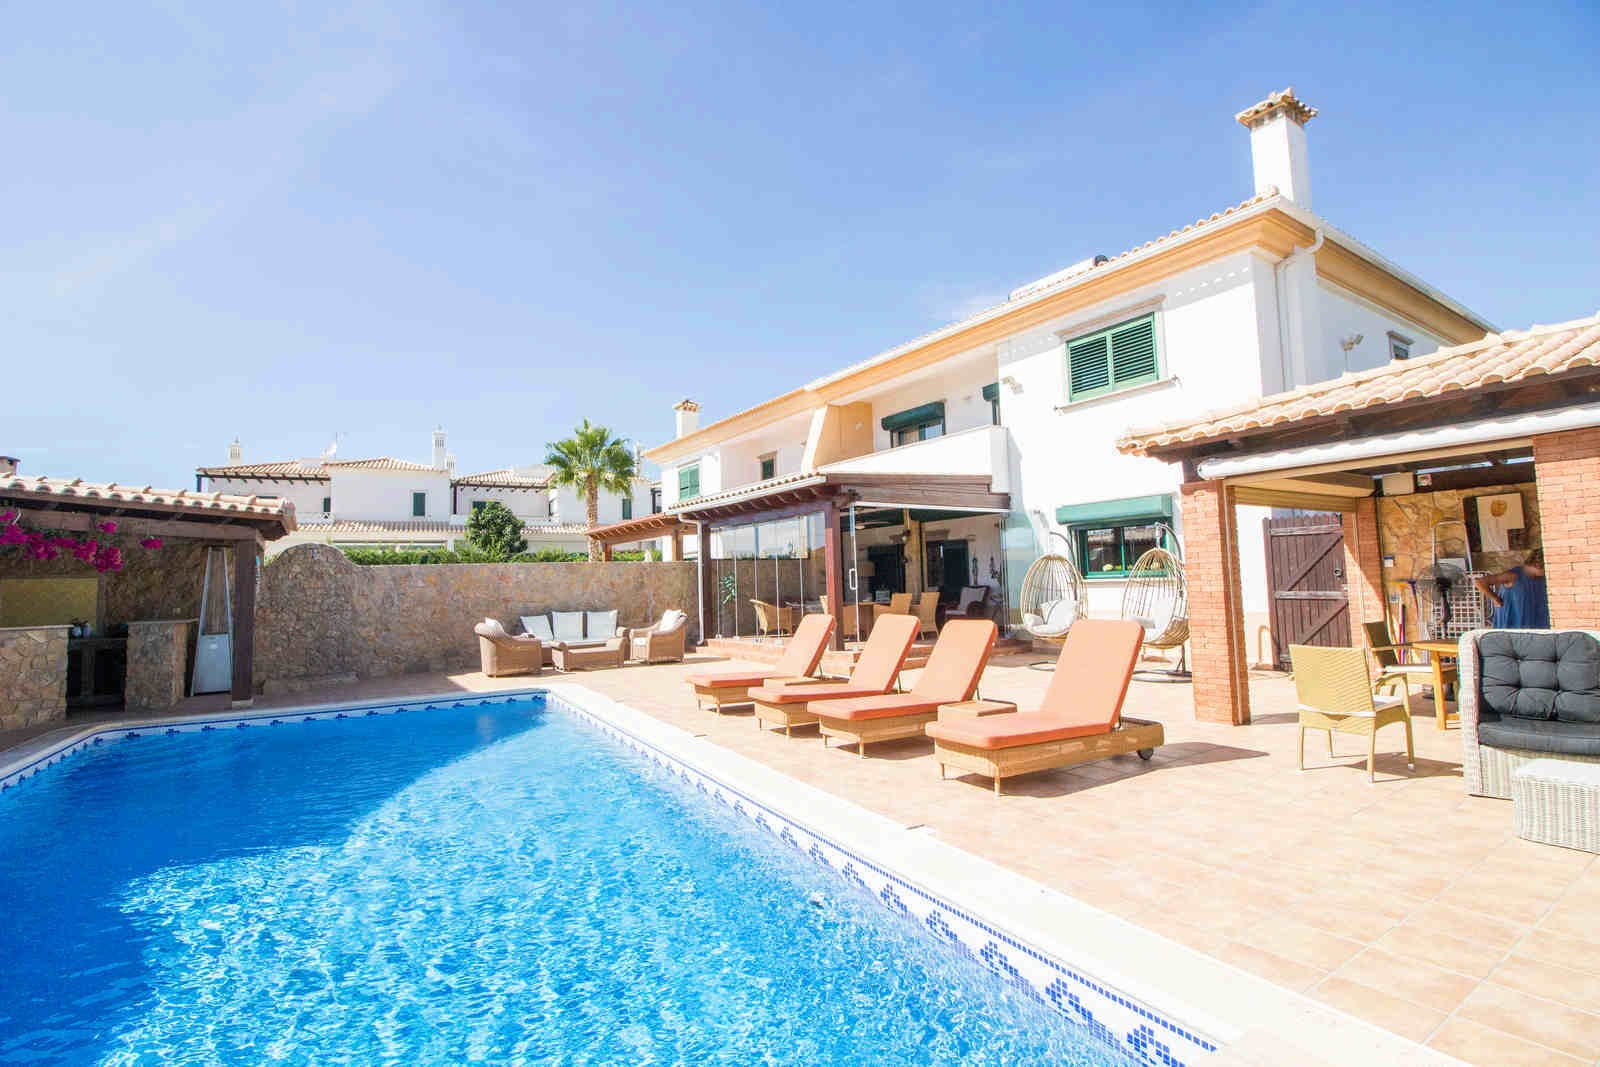 4 Bedroom Villa Almancil, Central Algarve Ref: PV3522